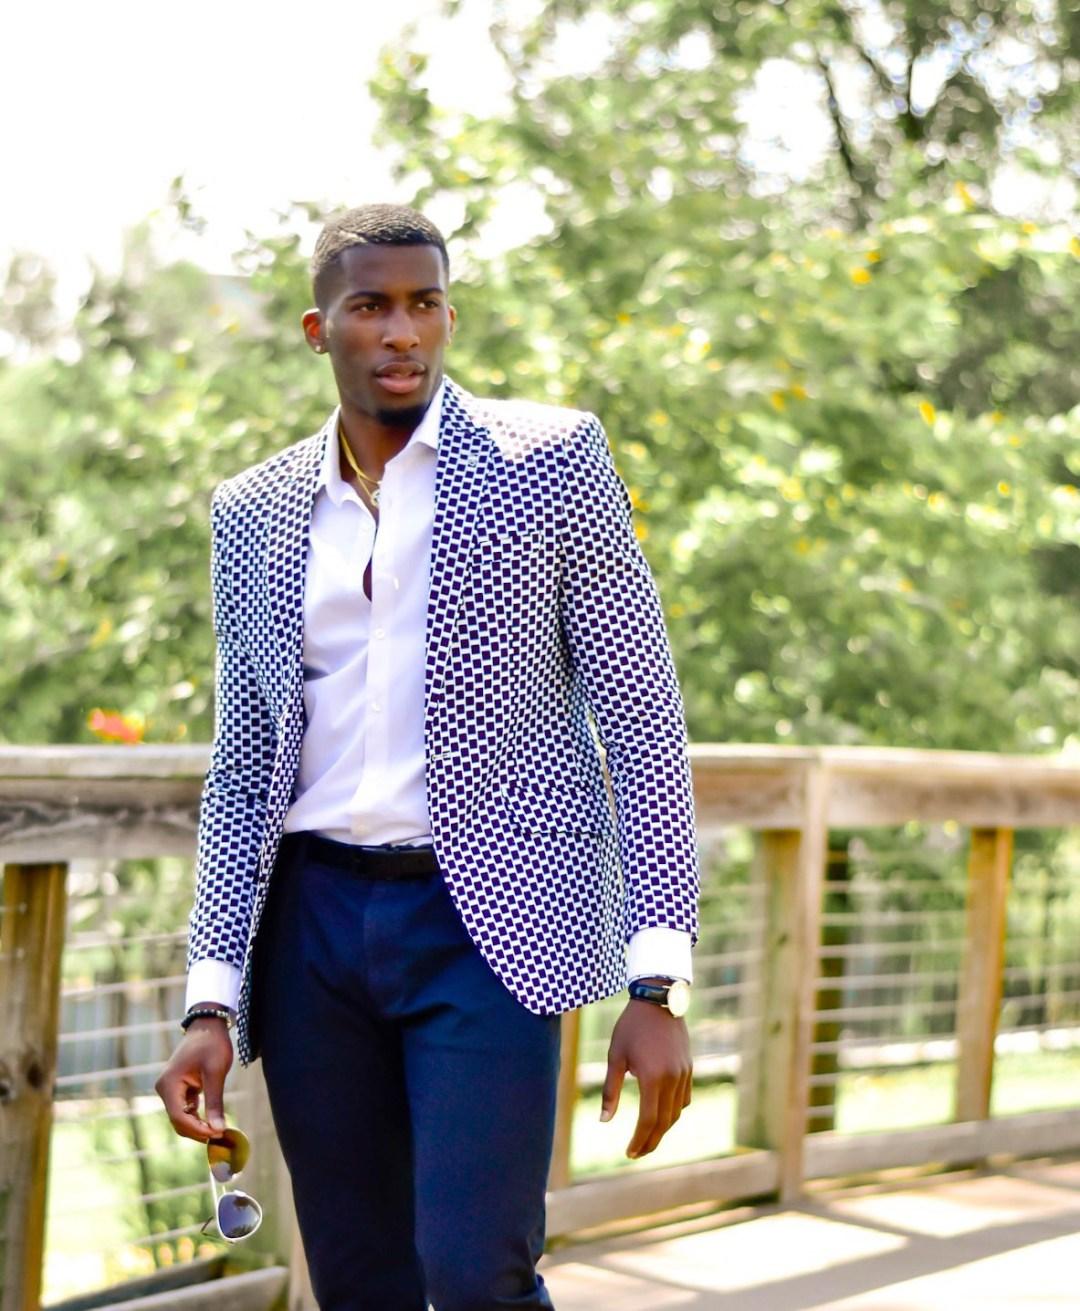 Daniel Obiefuna Nwandu, Fondu, Portrait Photography, Nigerian Male Model, Igbo, Artist, Designer, Commissioner of Reflex Football, RFB, African Traditional Fit, Yoruba, Men's Fashion